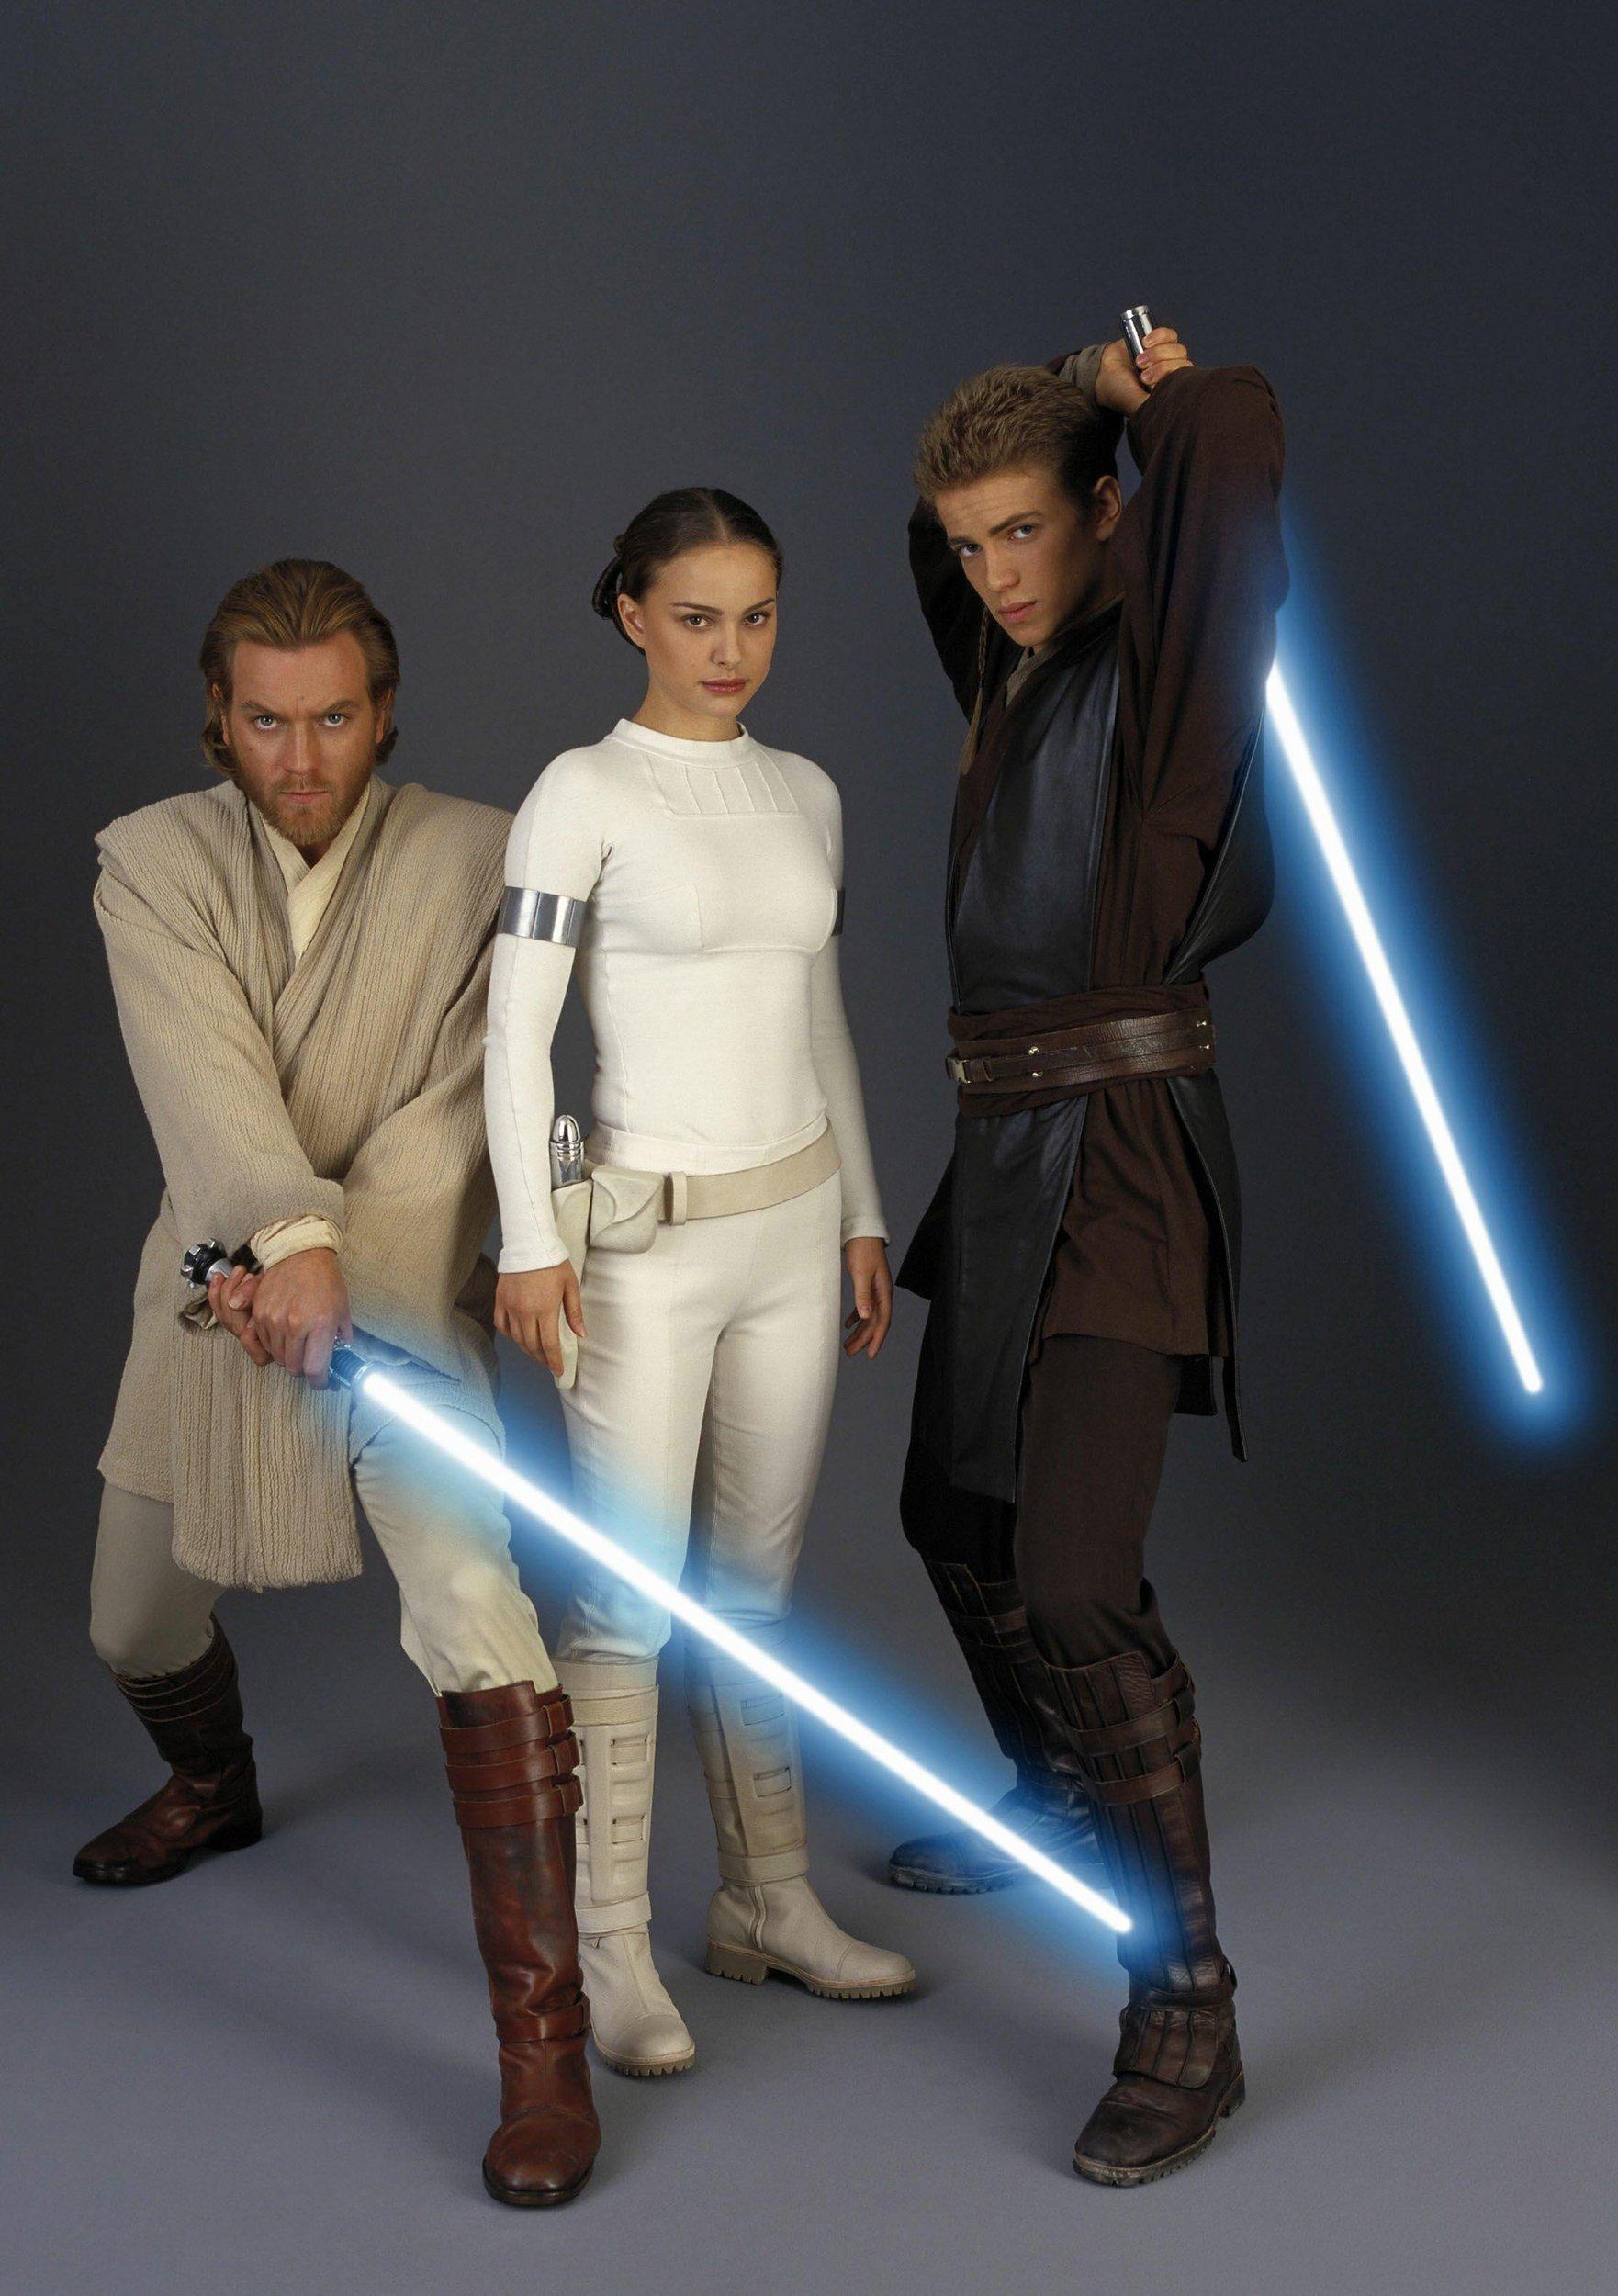 Star wars fake porn porn picture